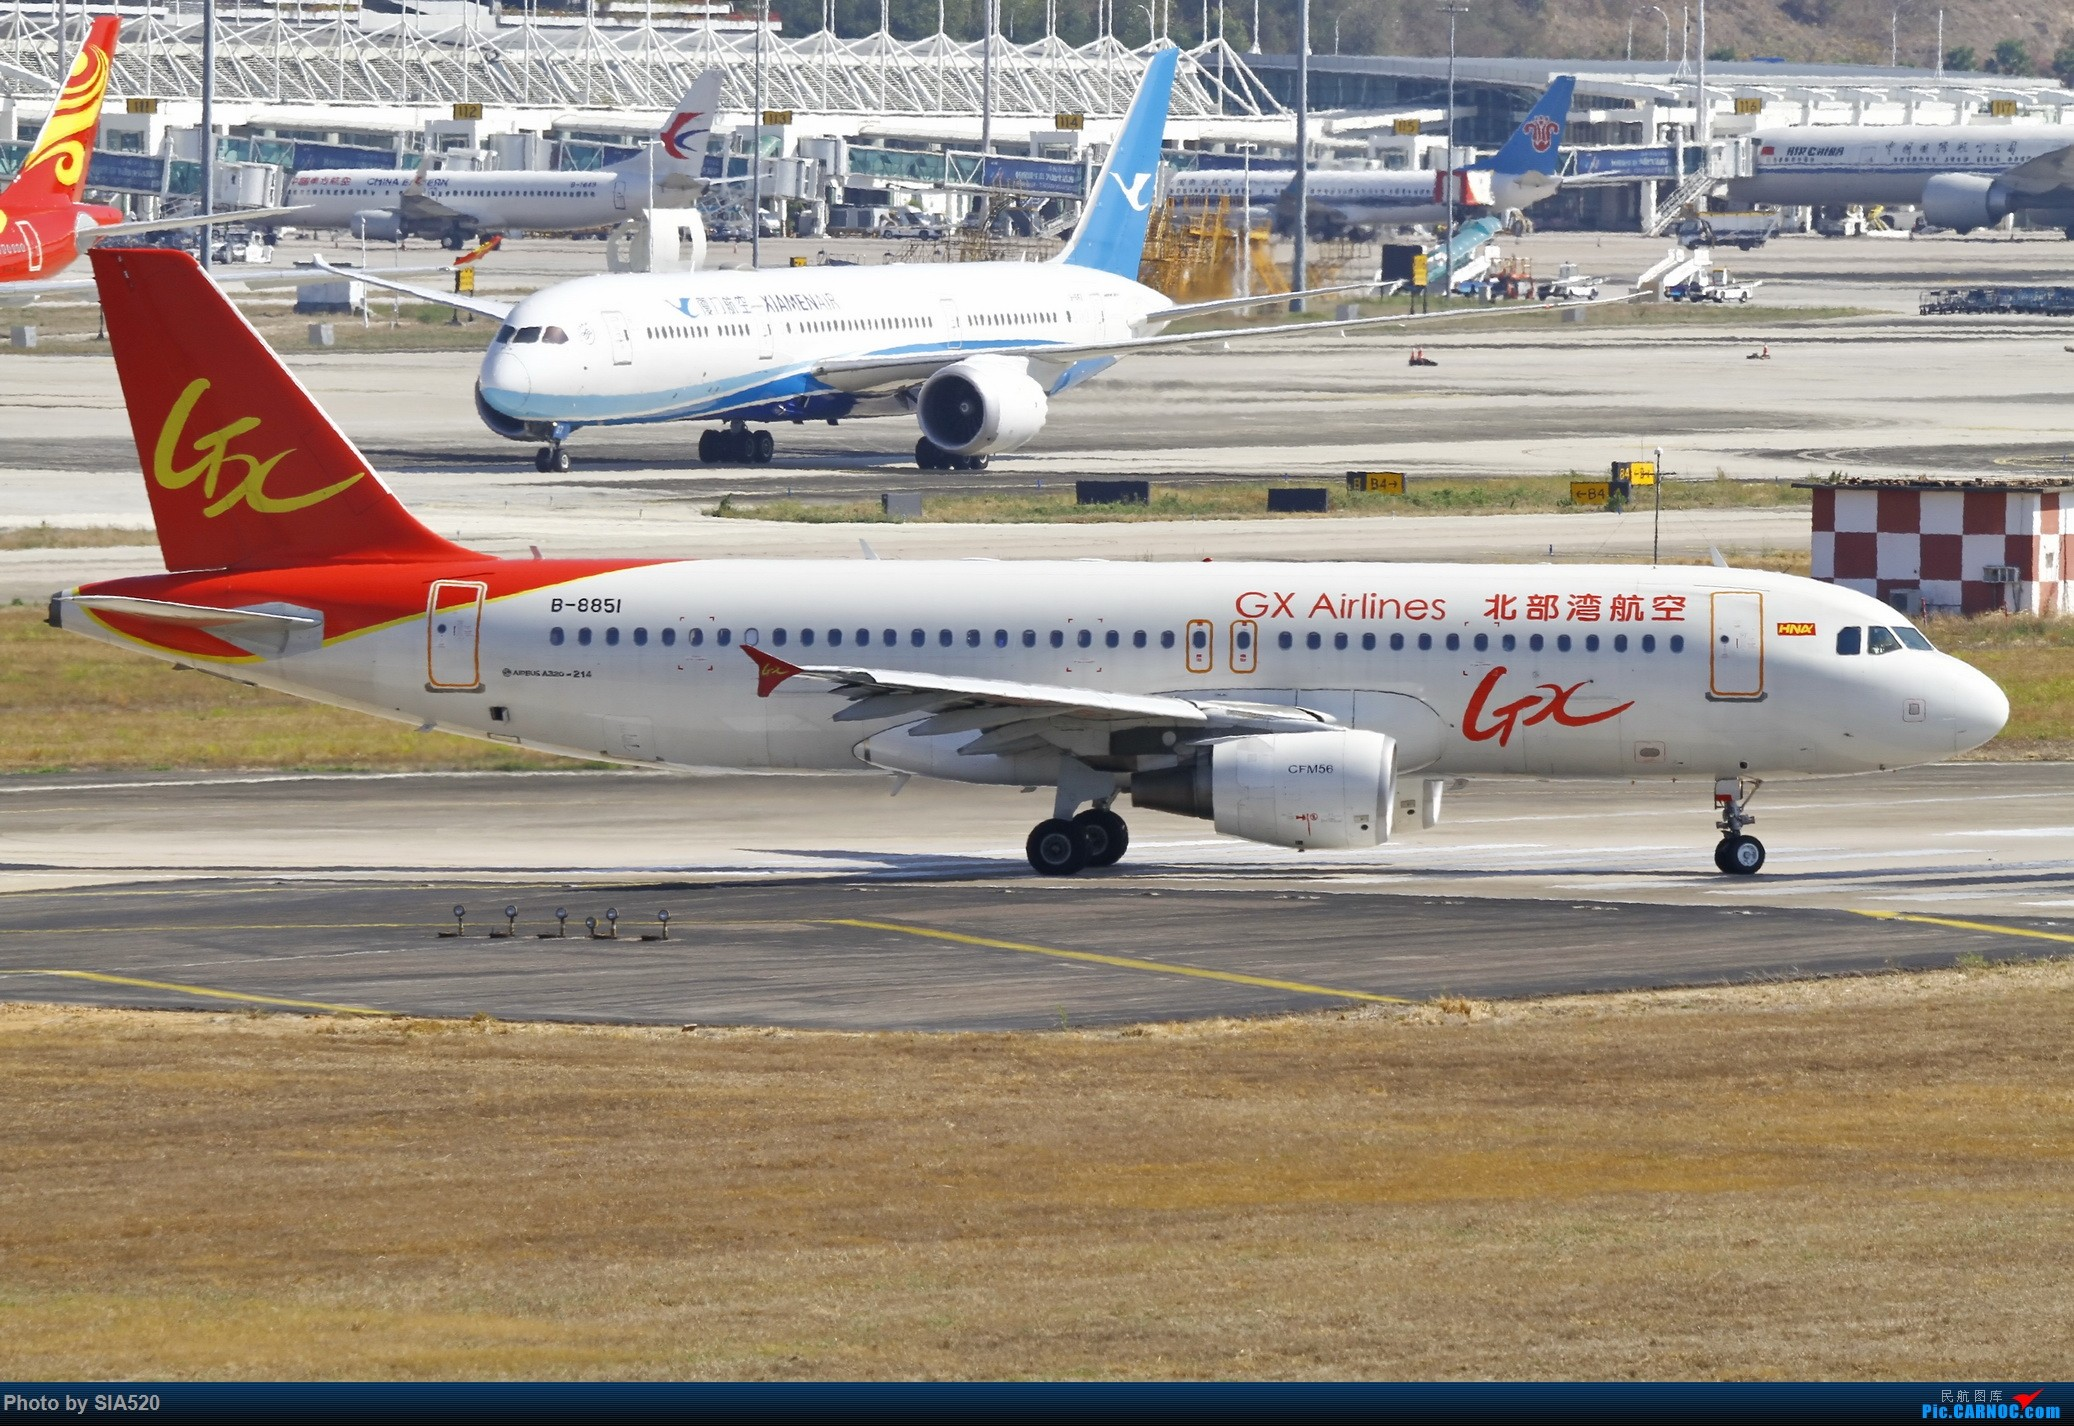 Re:[原创]北京人儿在三亚—600mm解锁凤凰 AIRBUS A320-200 B-8851 中国三亚凤凰国际机场